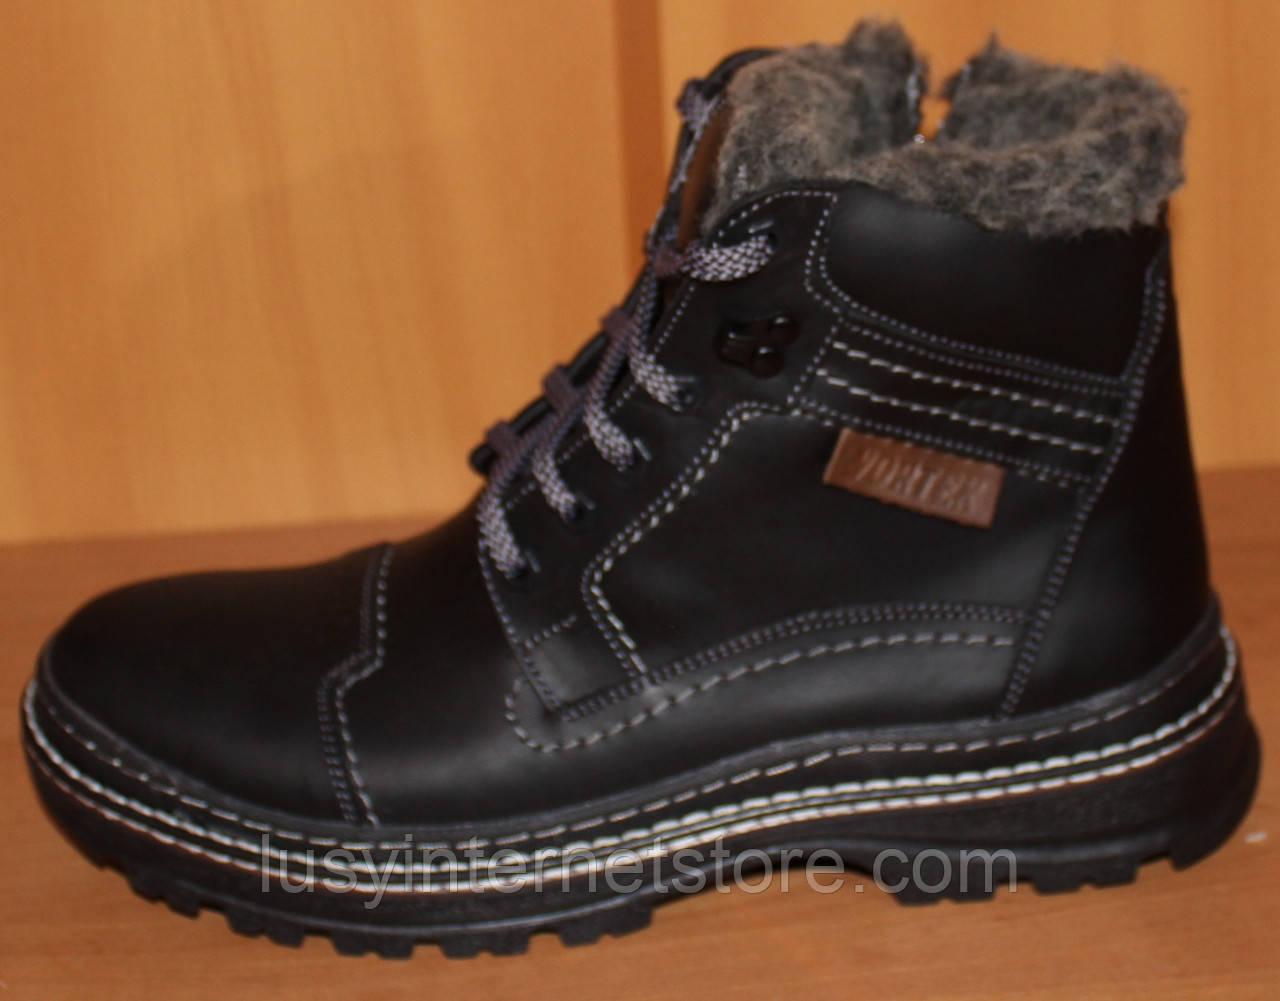 ea0e47301fd2 Мужские ботинки зимние на шнурках кожа, зимняя мужская обувь от  производителя модель ВА71 - Lusy